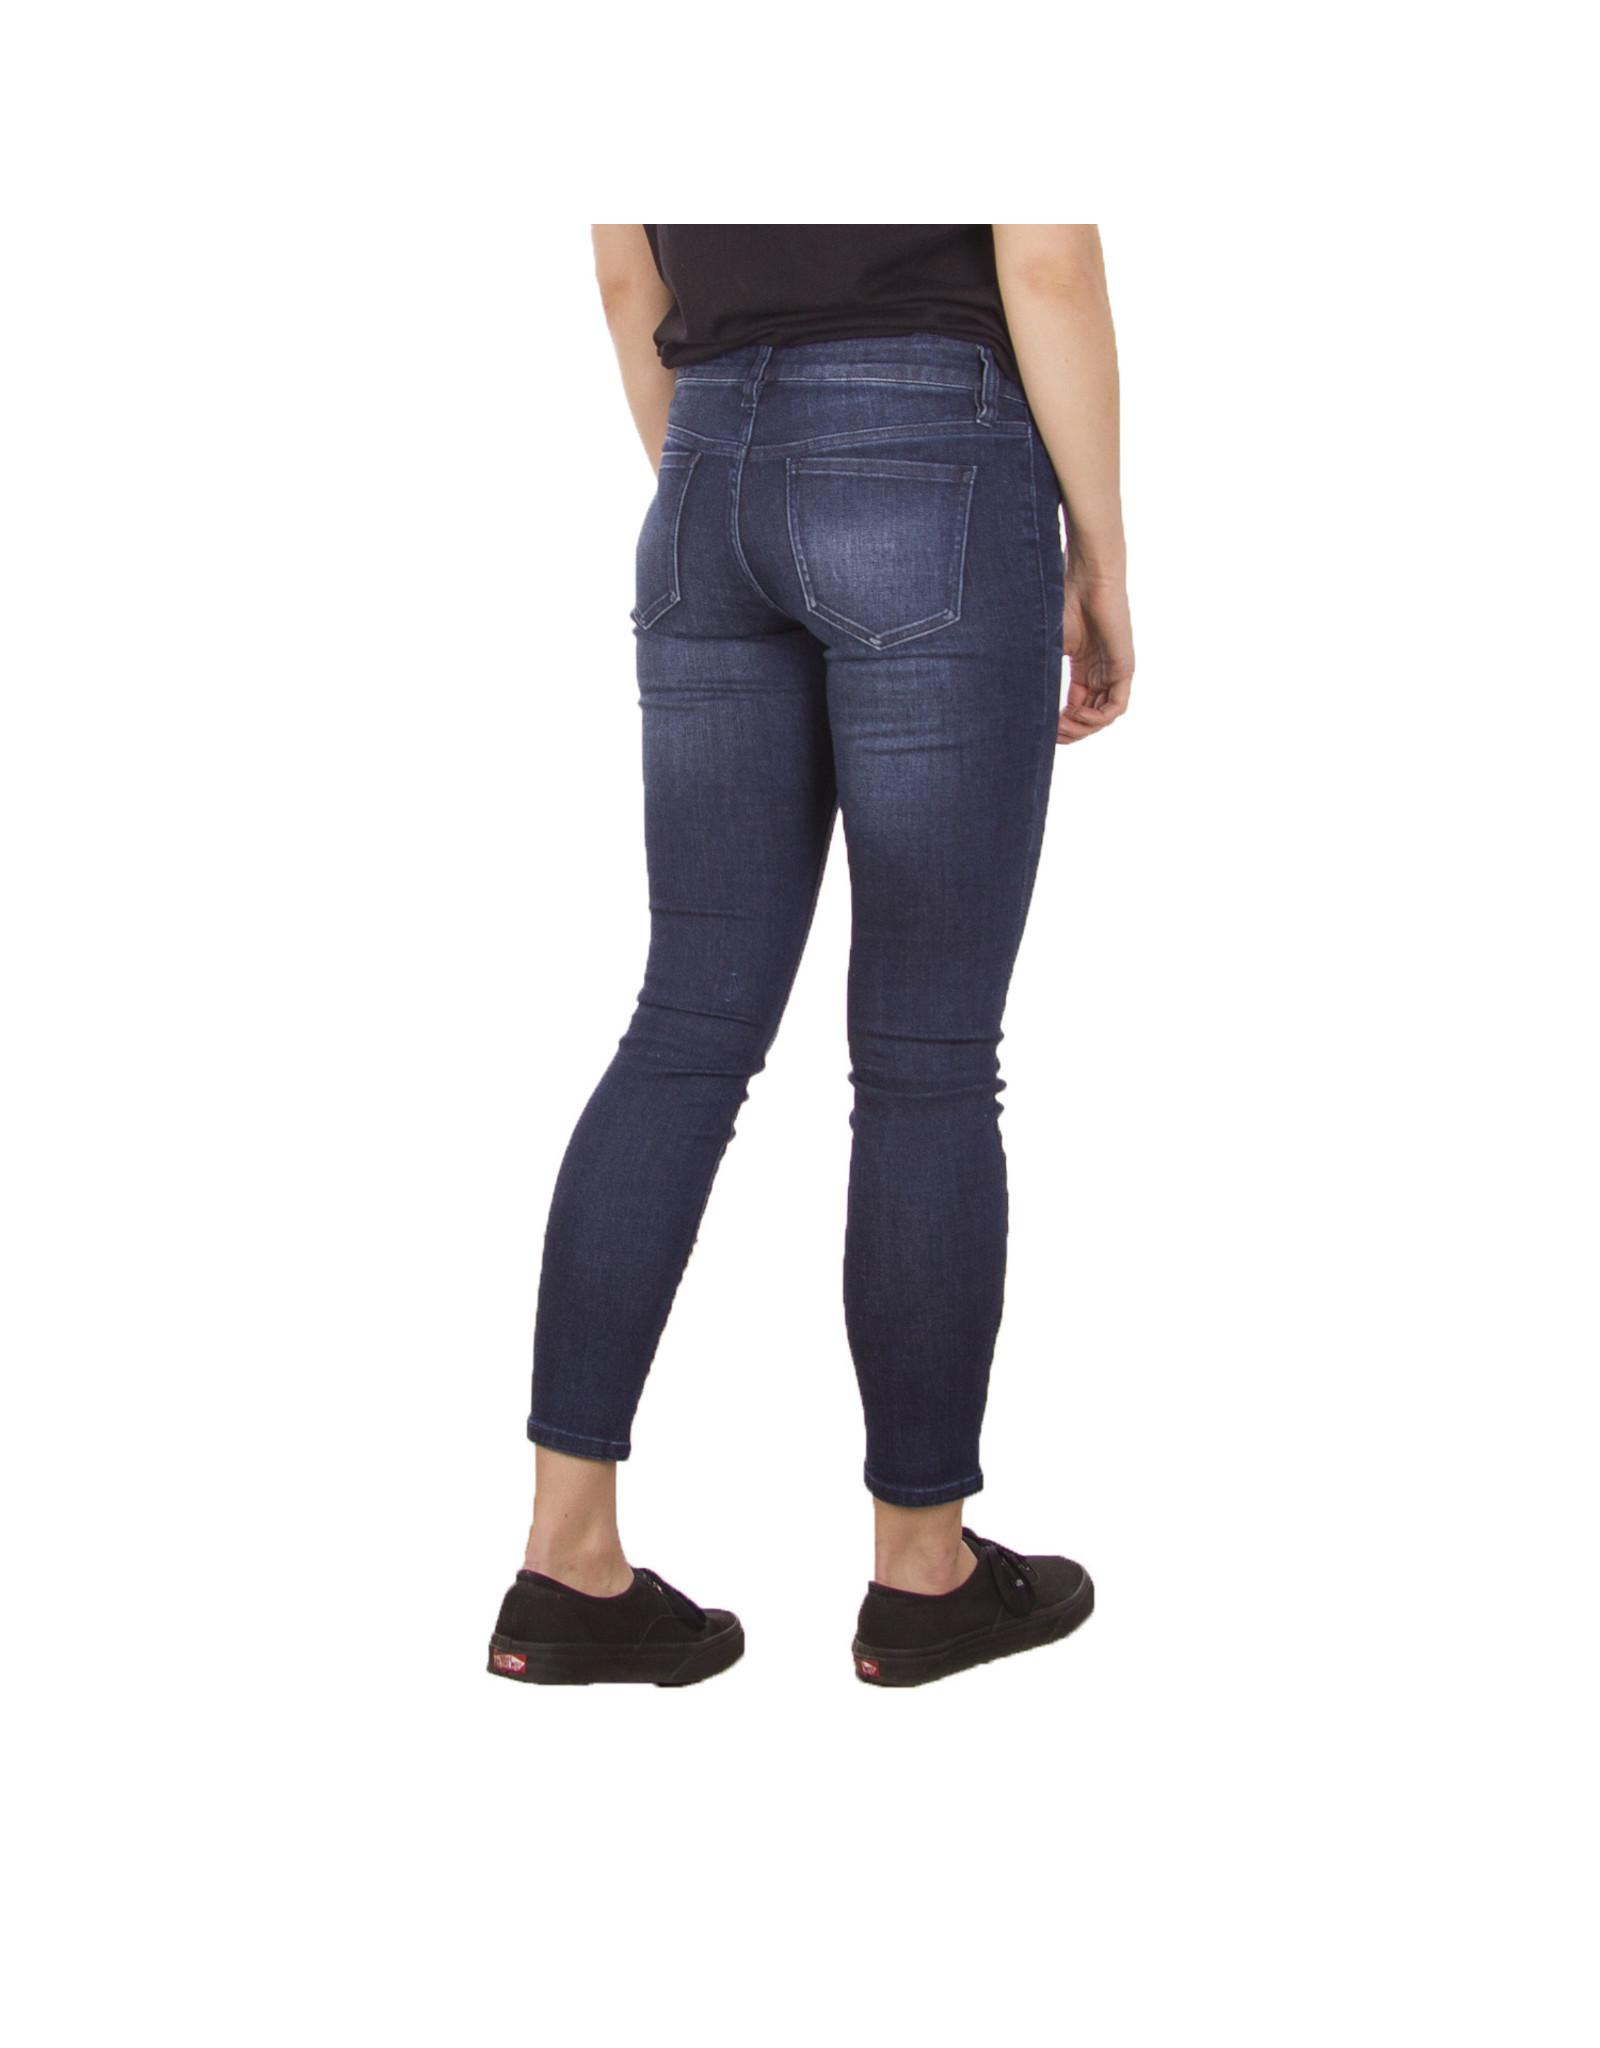 volcom Volcom - jeans 1991 straight